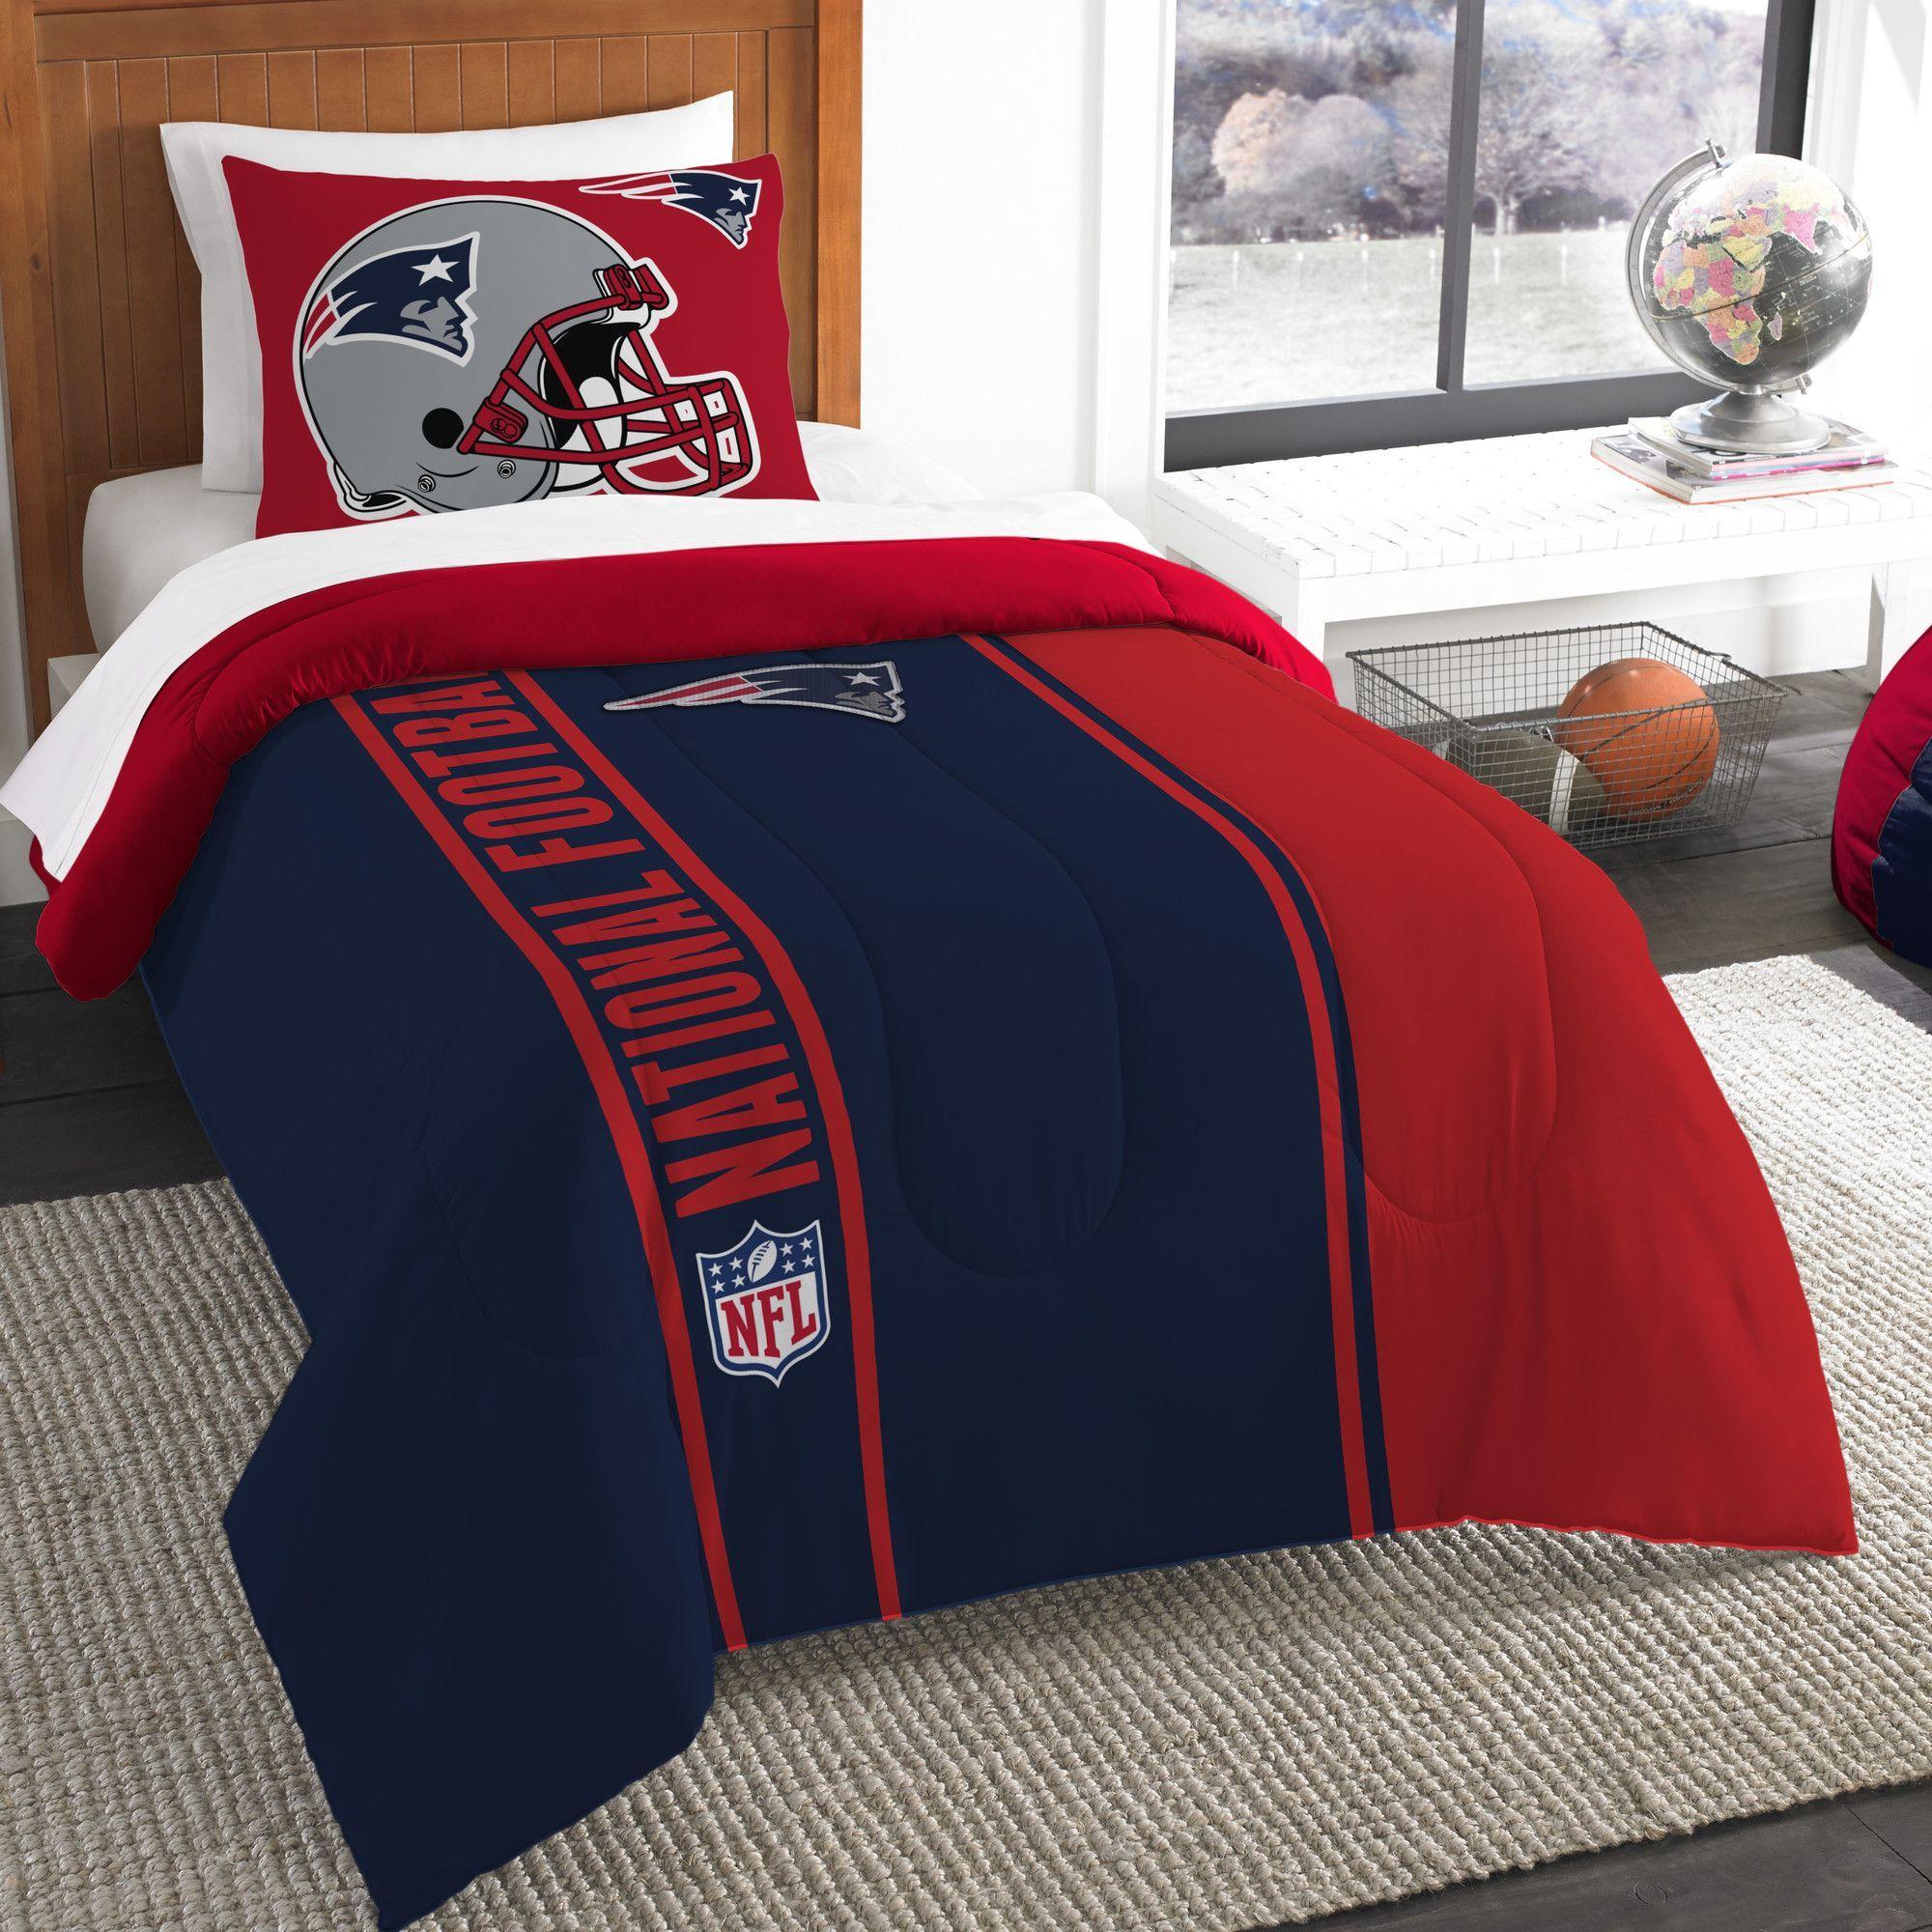 Nfl Patriots Helmet Comforter Set Products Pinterest